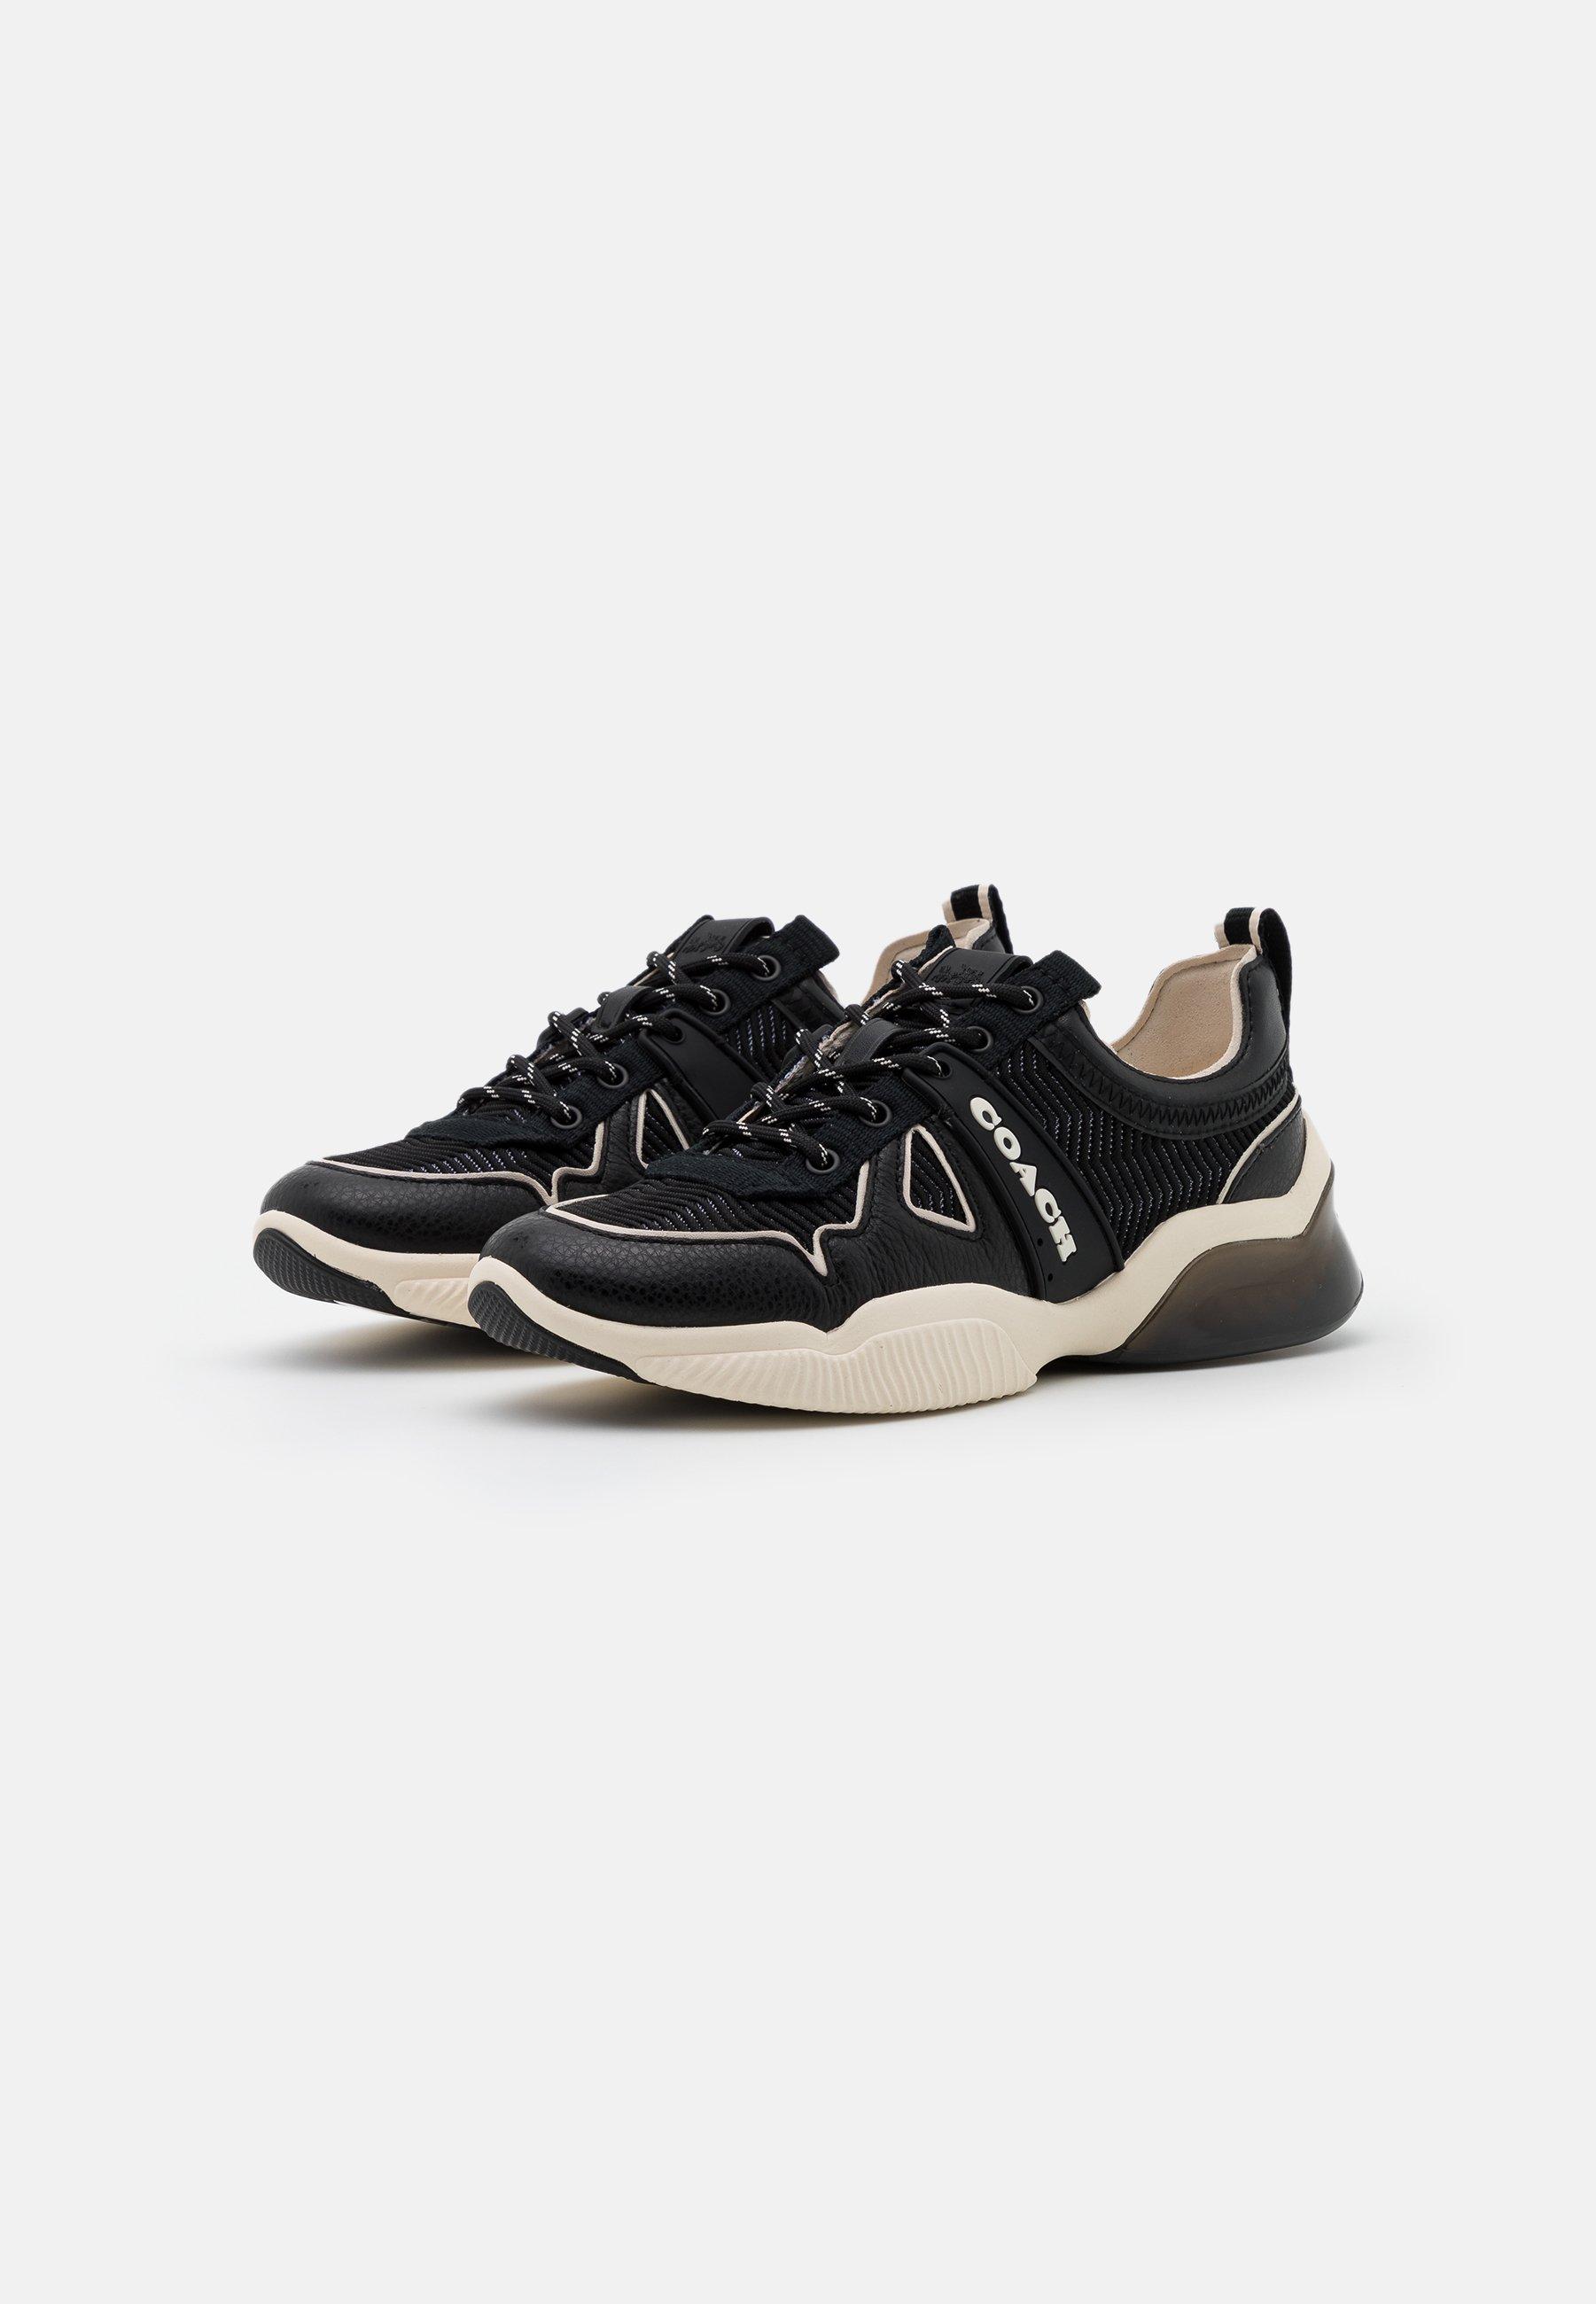 Coach Citysole Runner - Sneakers Black